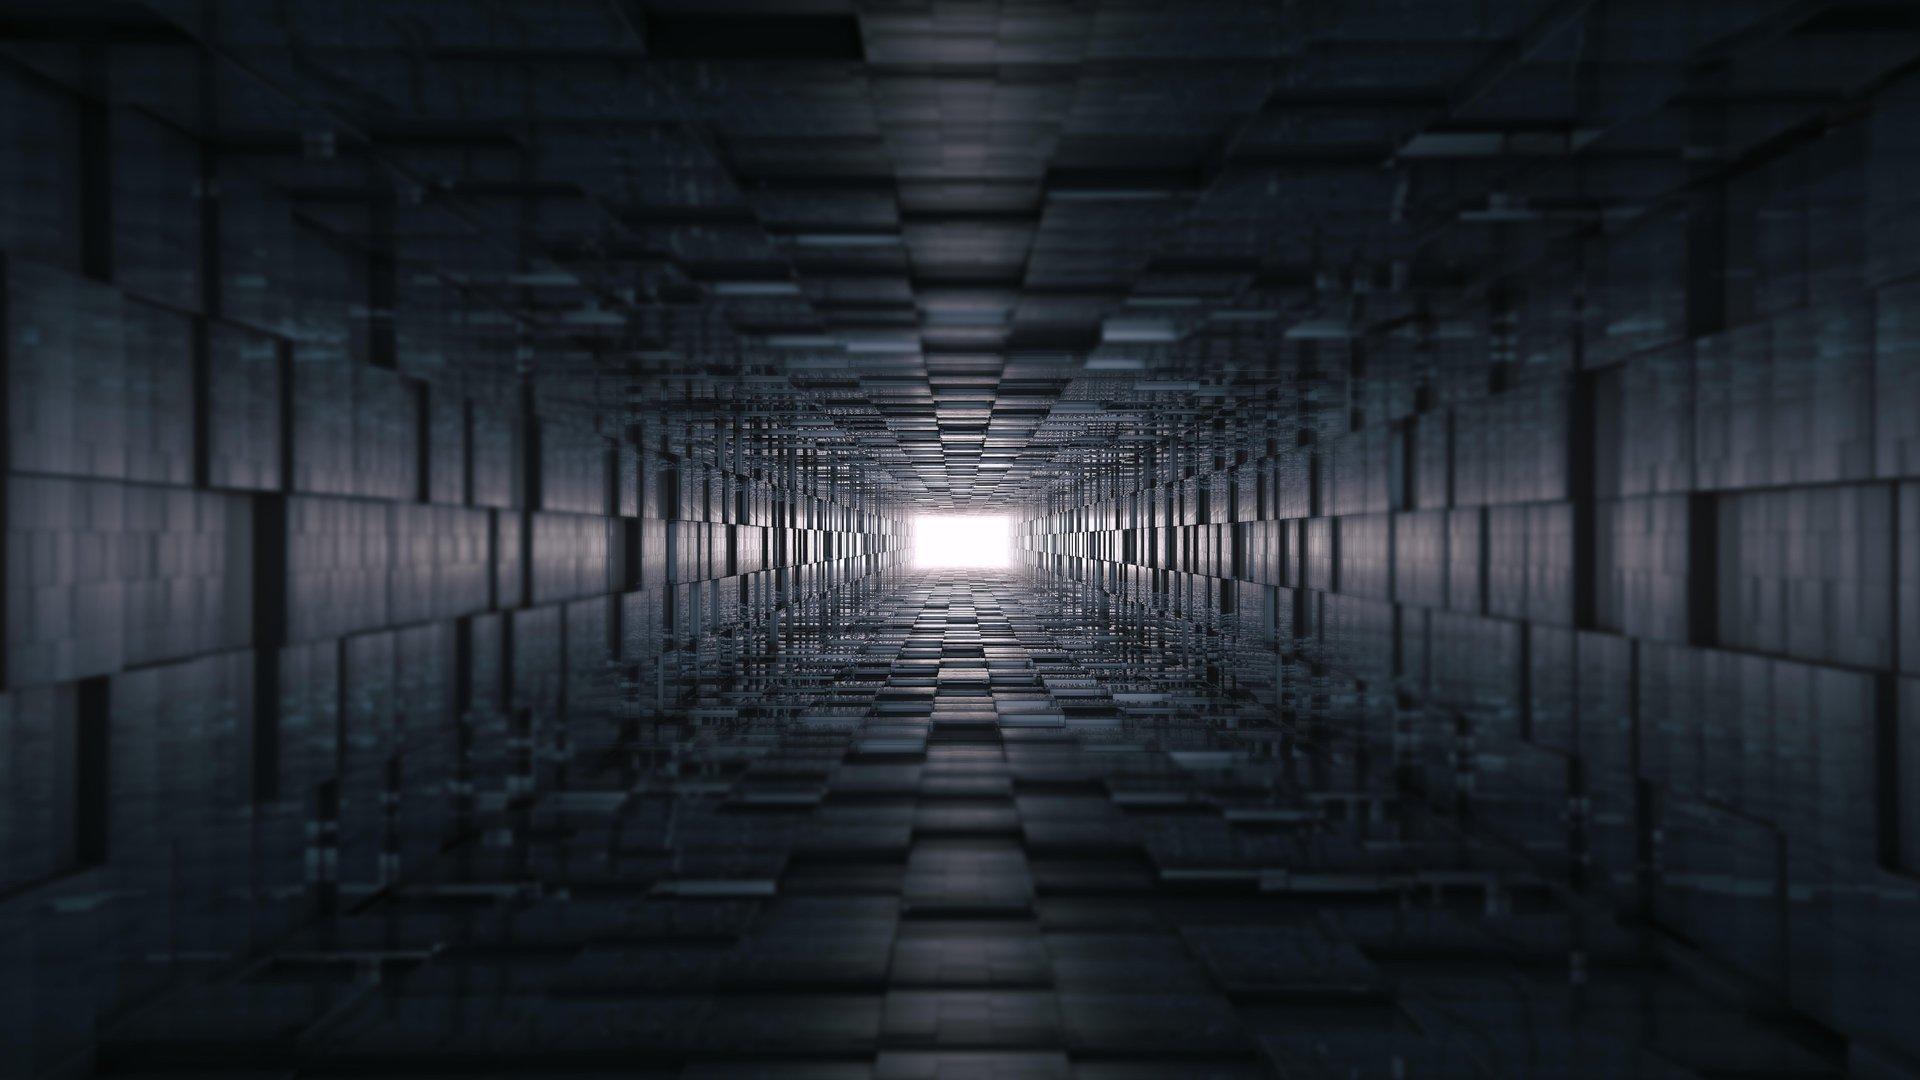 General 1920x1080 digital art artwork tunnel abstract 3D Abstract texture cube geometry lines 3D 3D Blocks CGI render